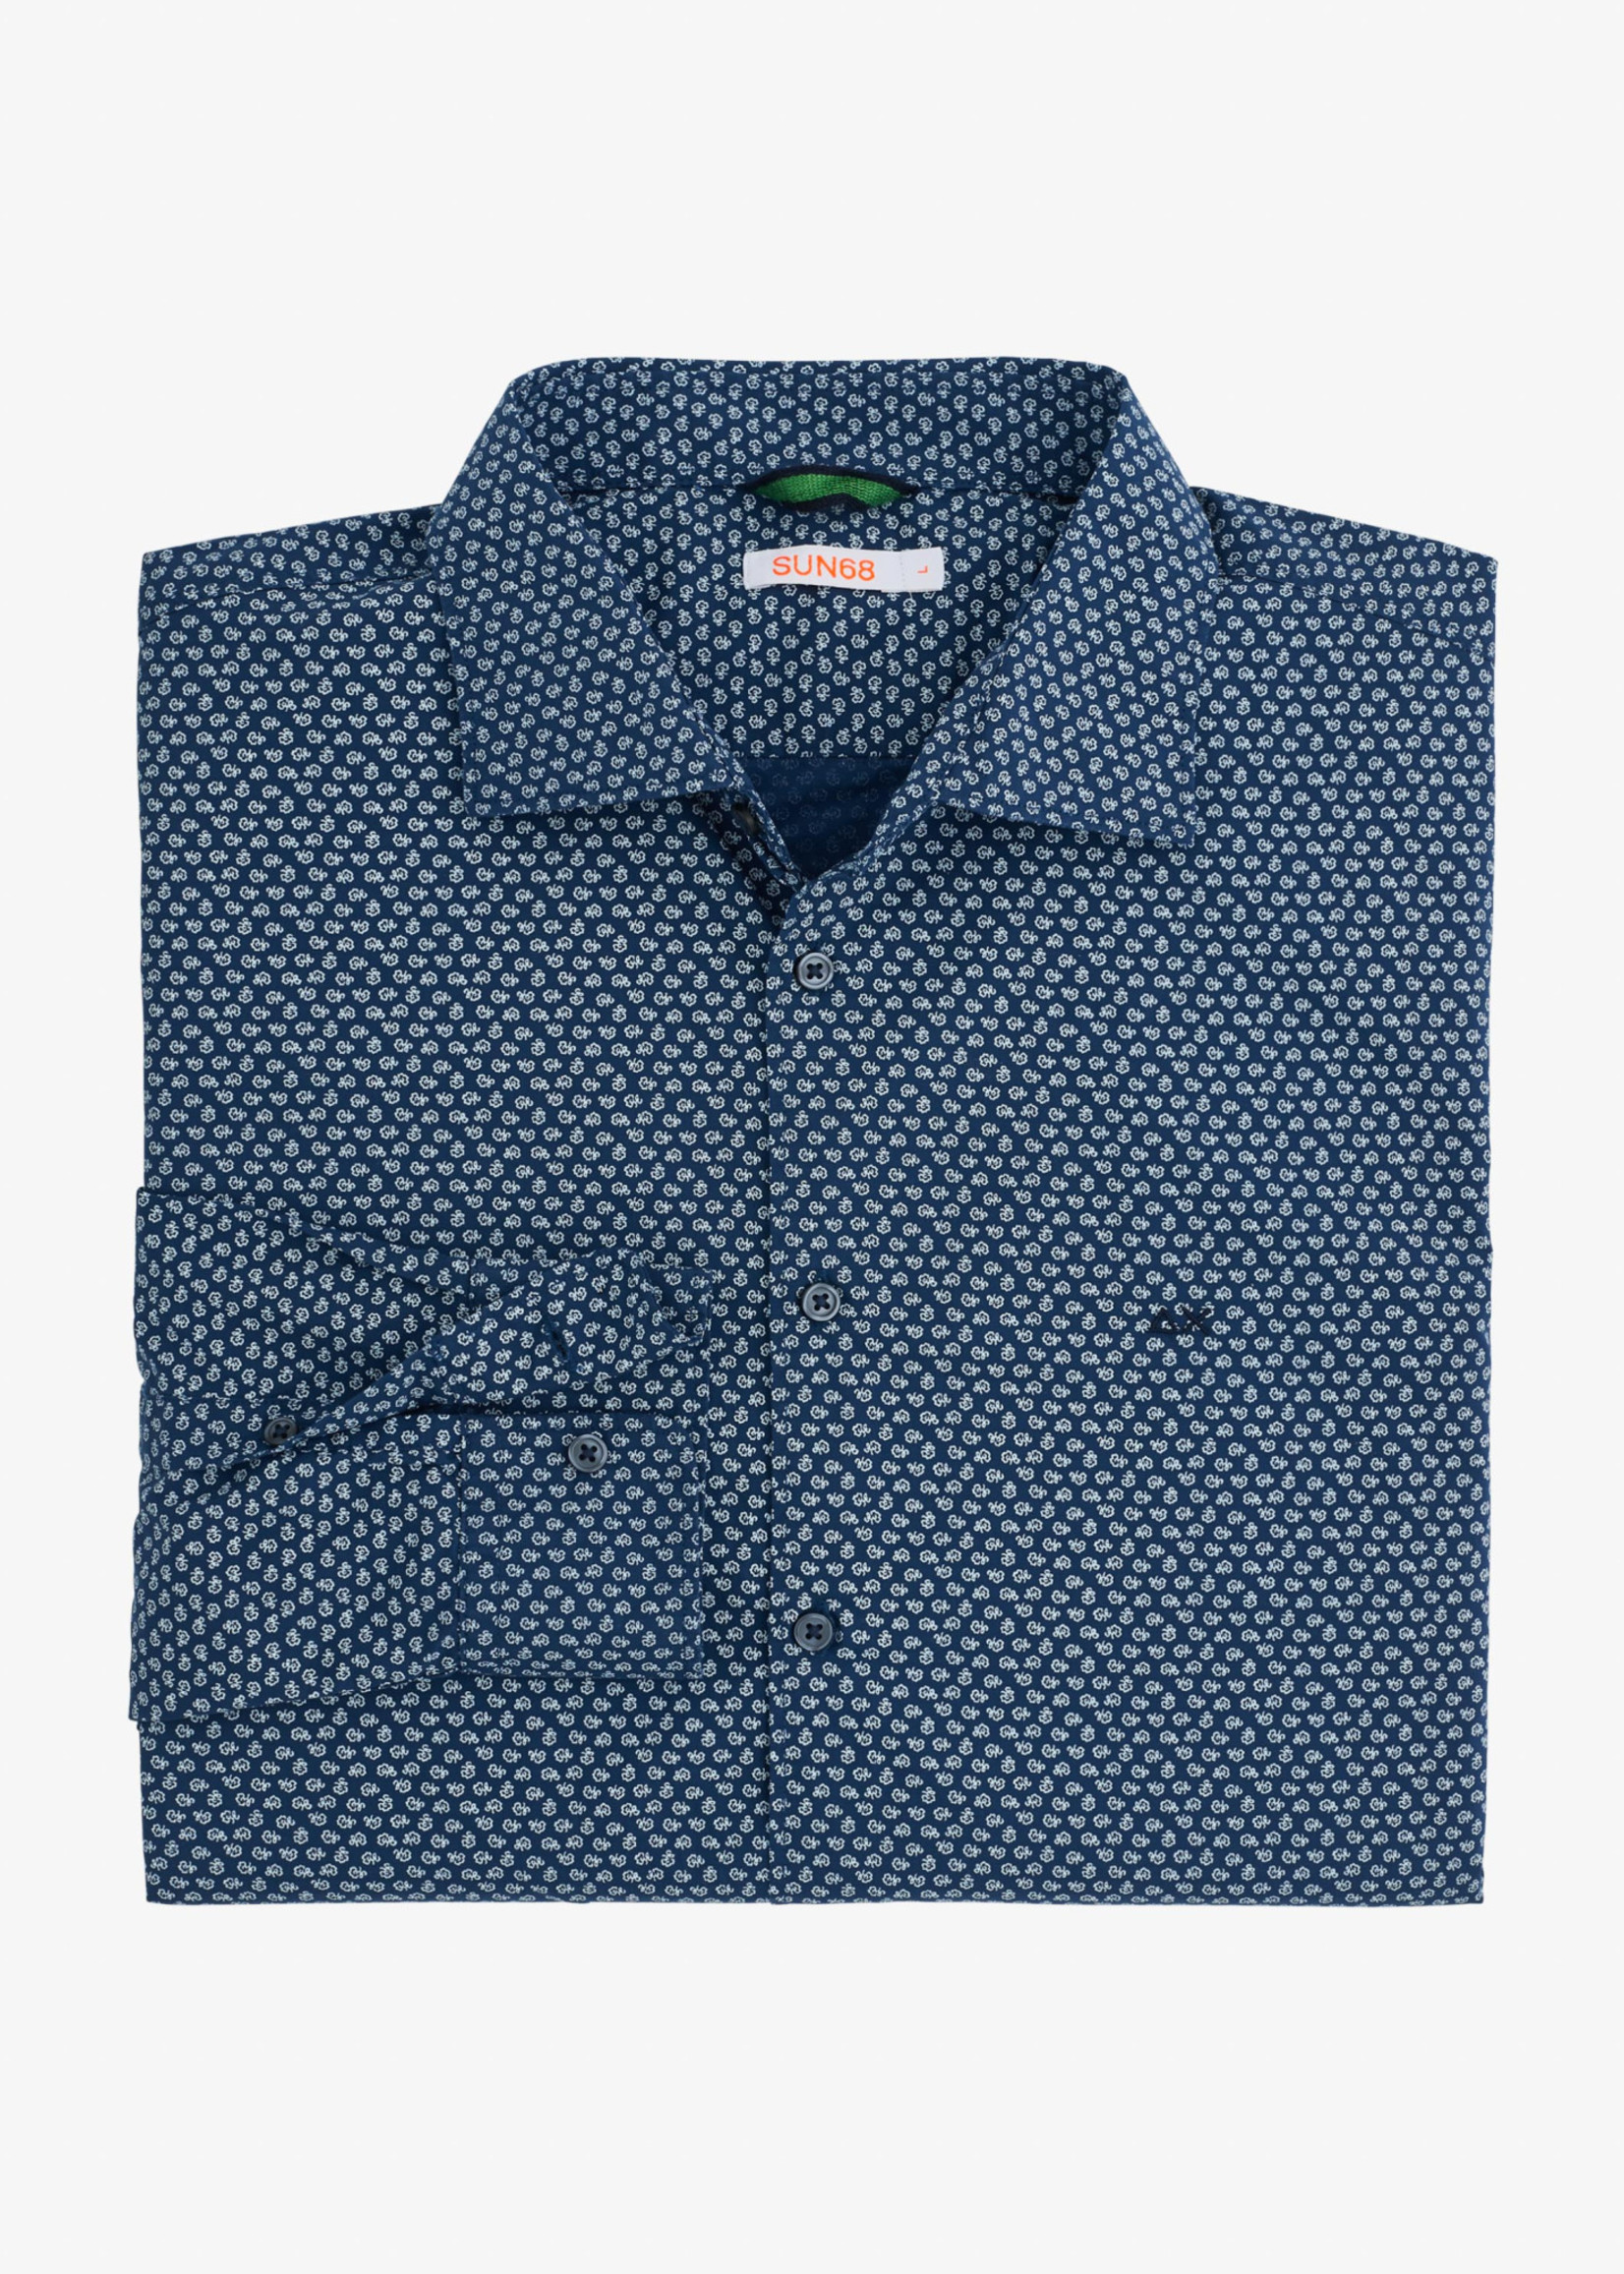 SUN68 Shirt Details French Collar L/S | Blauw/Wit | SUN68